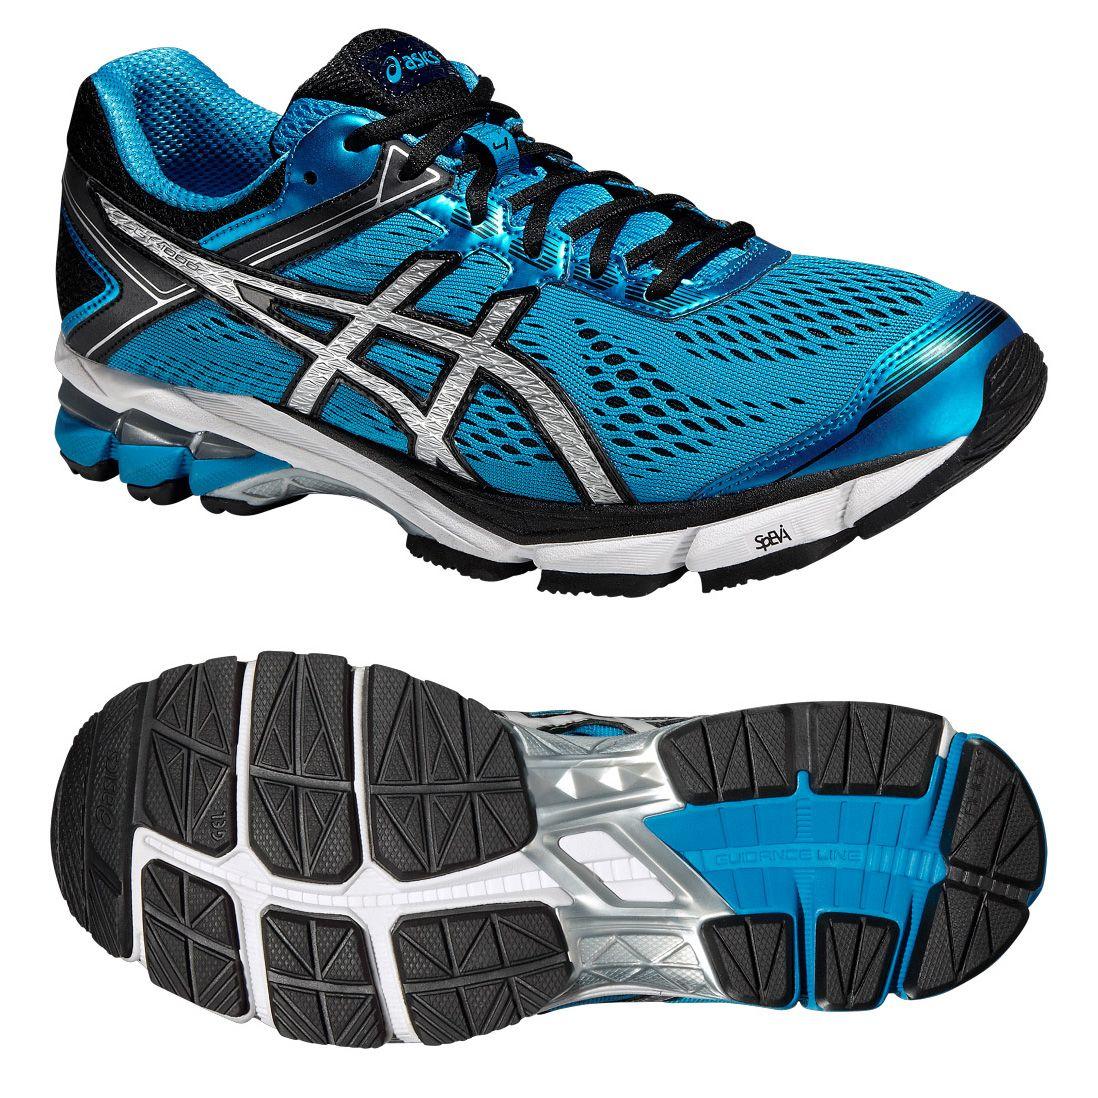 Asics GT-1000 4 Mens Running Shoes - Sweatband.com